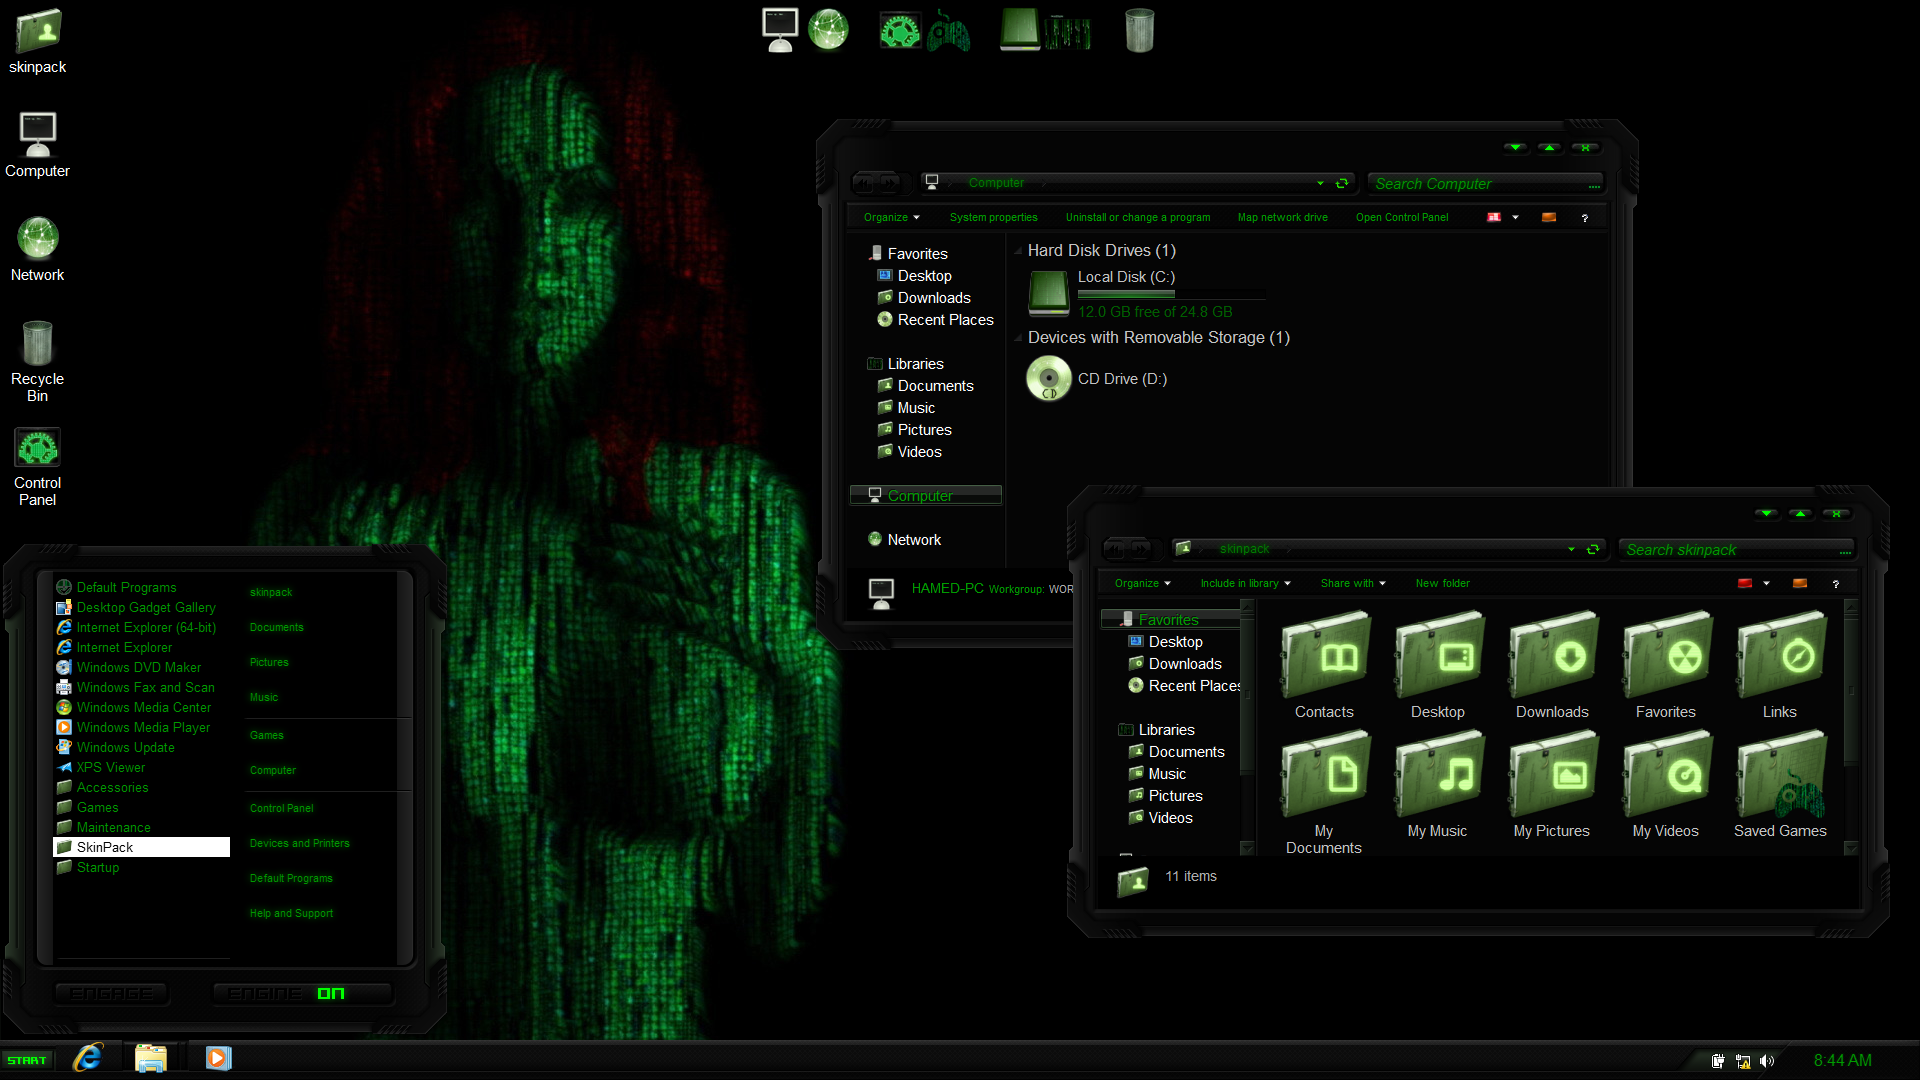 Matrix SkinPack for Win10/8 1/7 - SkinPack - Customize Your